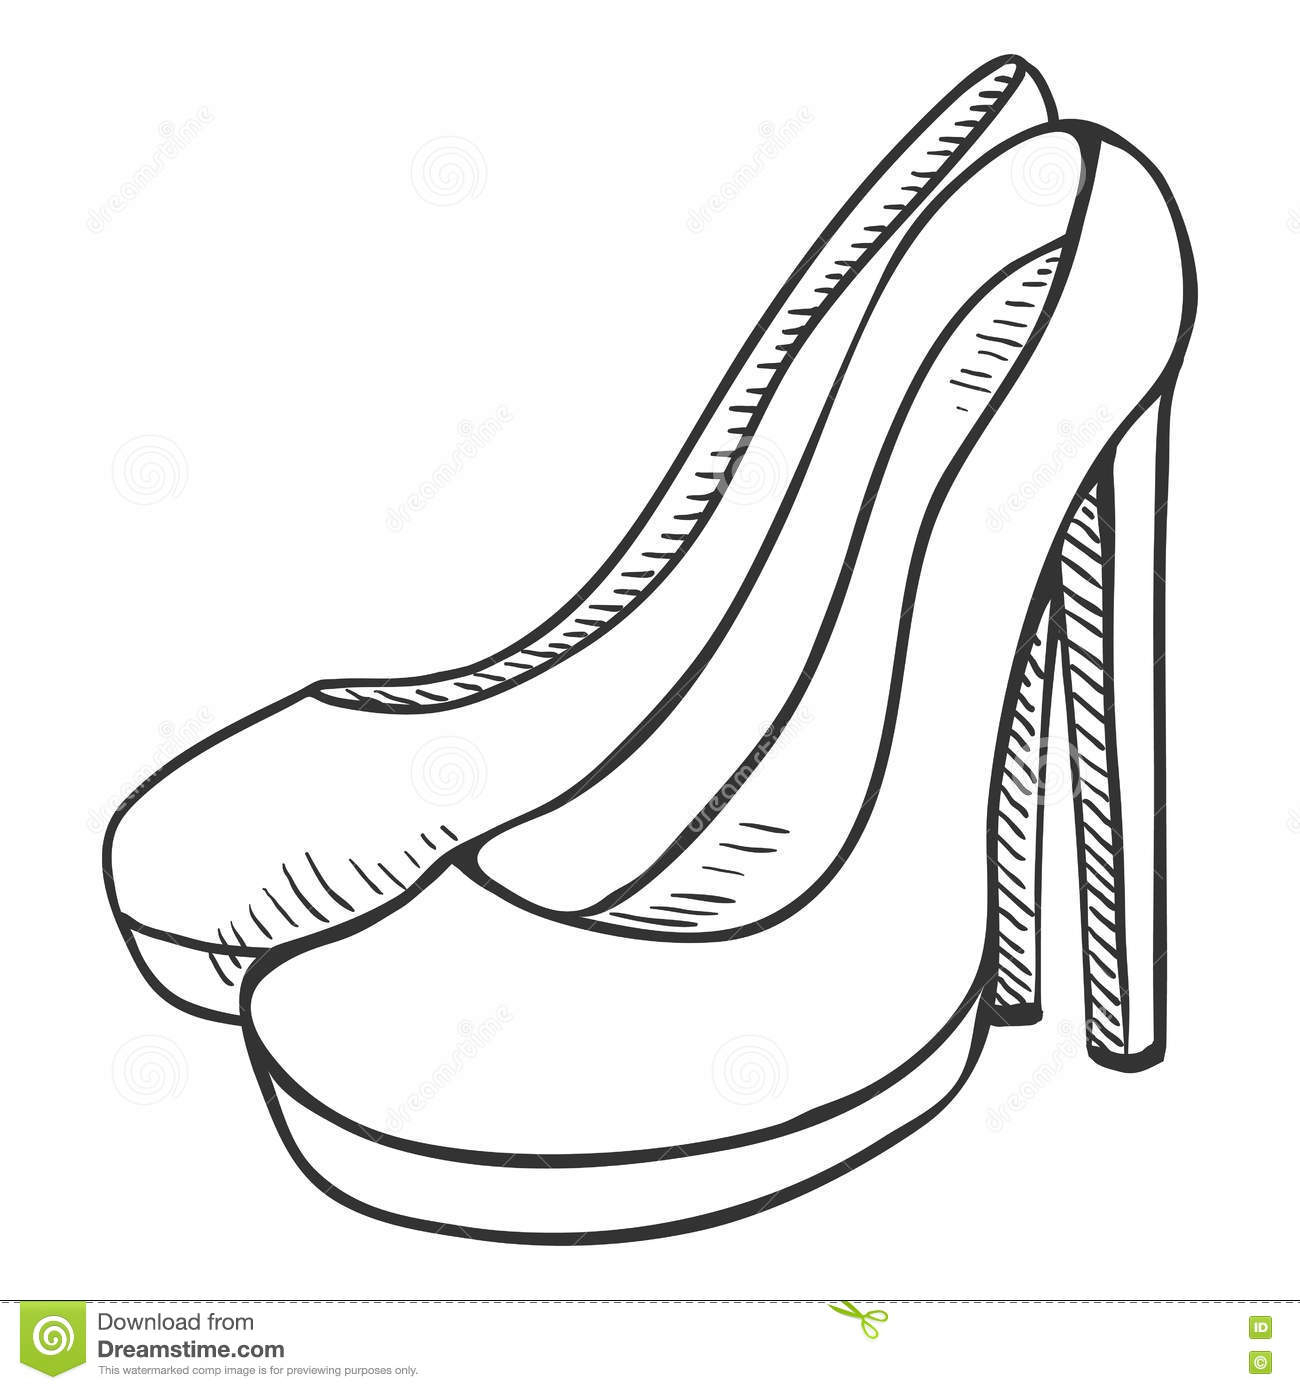 1300x1390 Cartoon Shoes Drawing Footwear High Heel Leather Shoes Cartoon